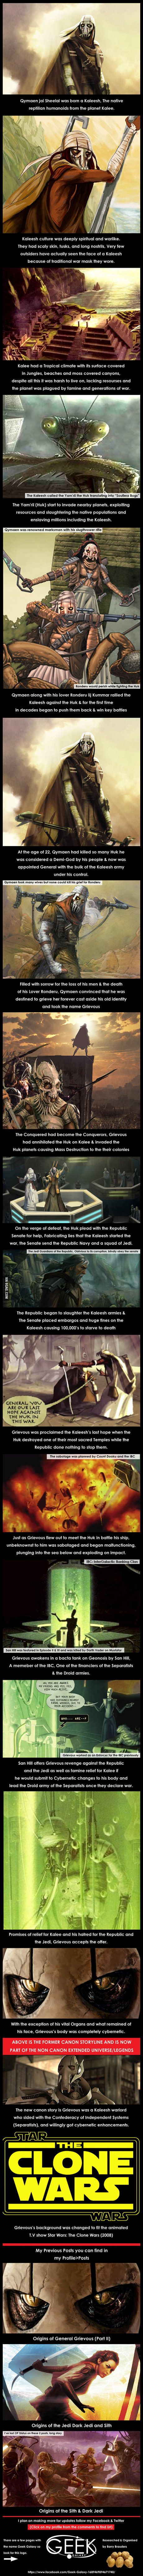 Origins of General Grievous (Part I) Star Wars History.